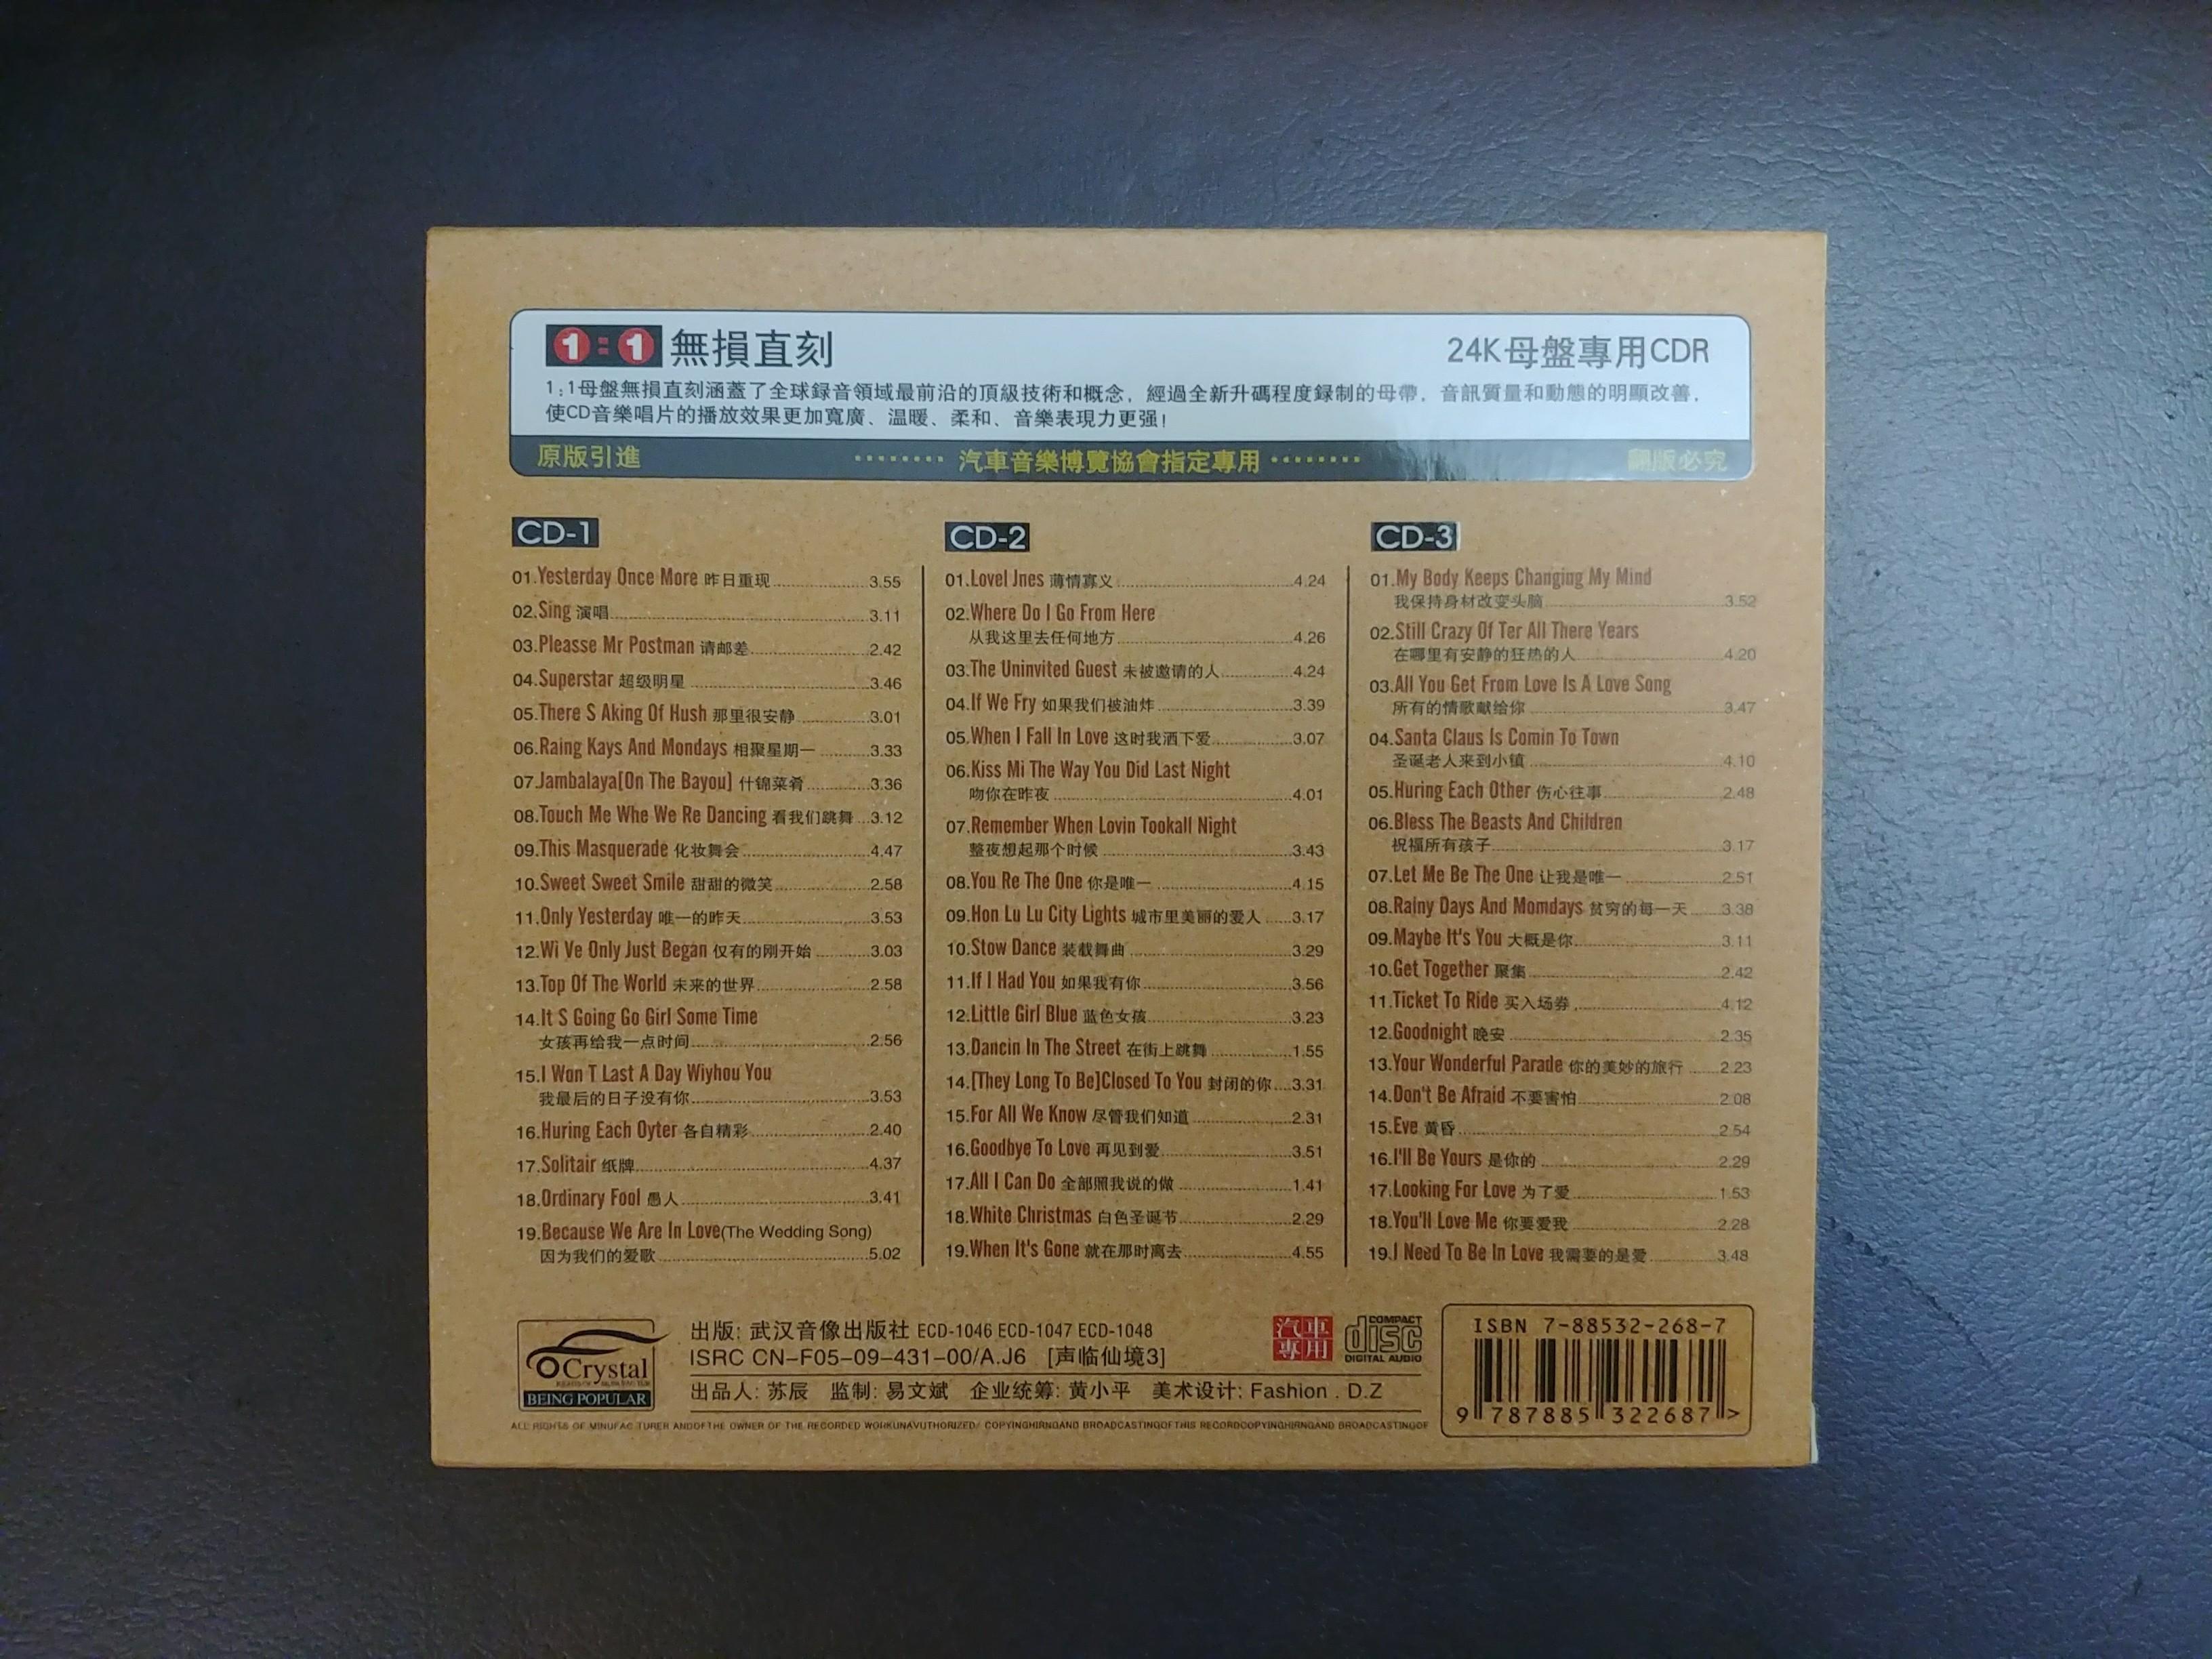 Carpenters Story 集錦無損高清3CD珍藏